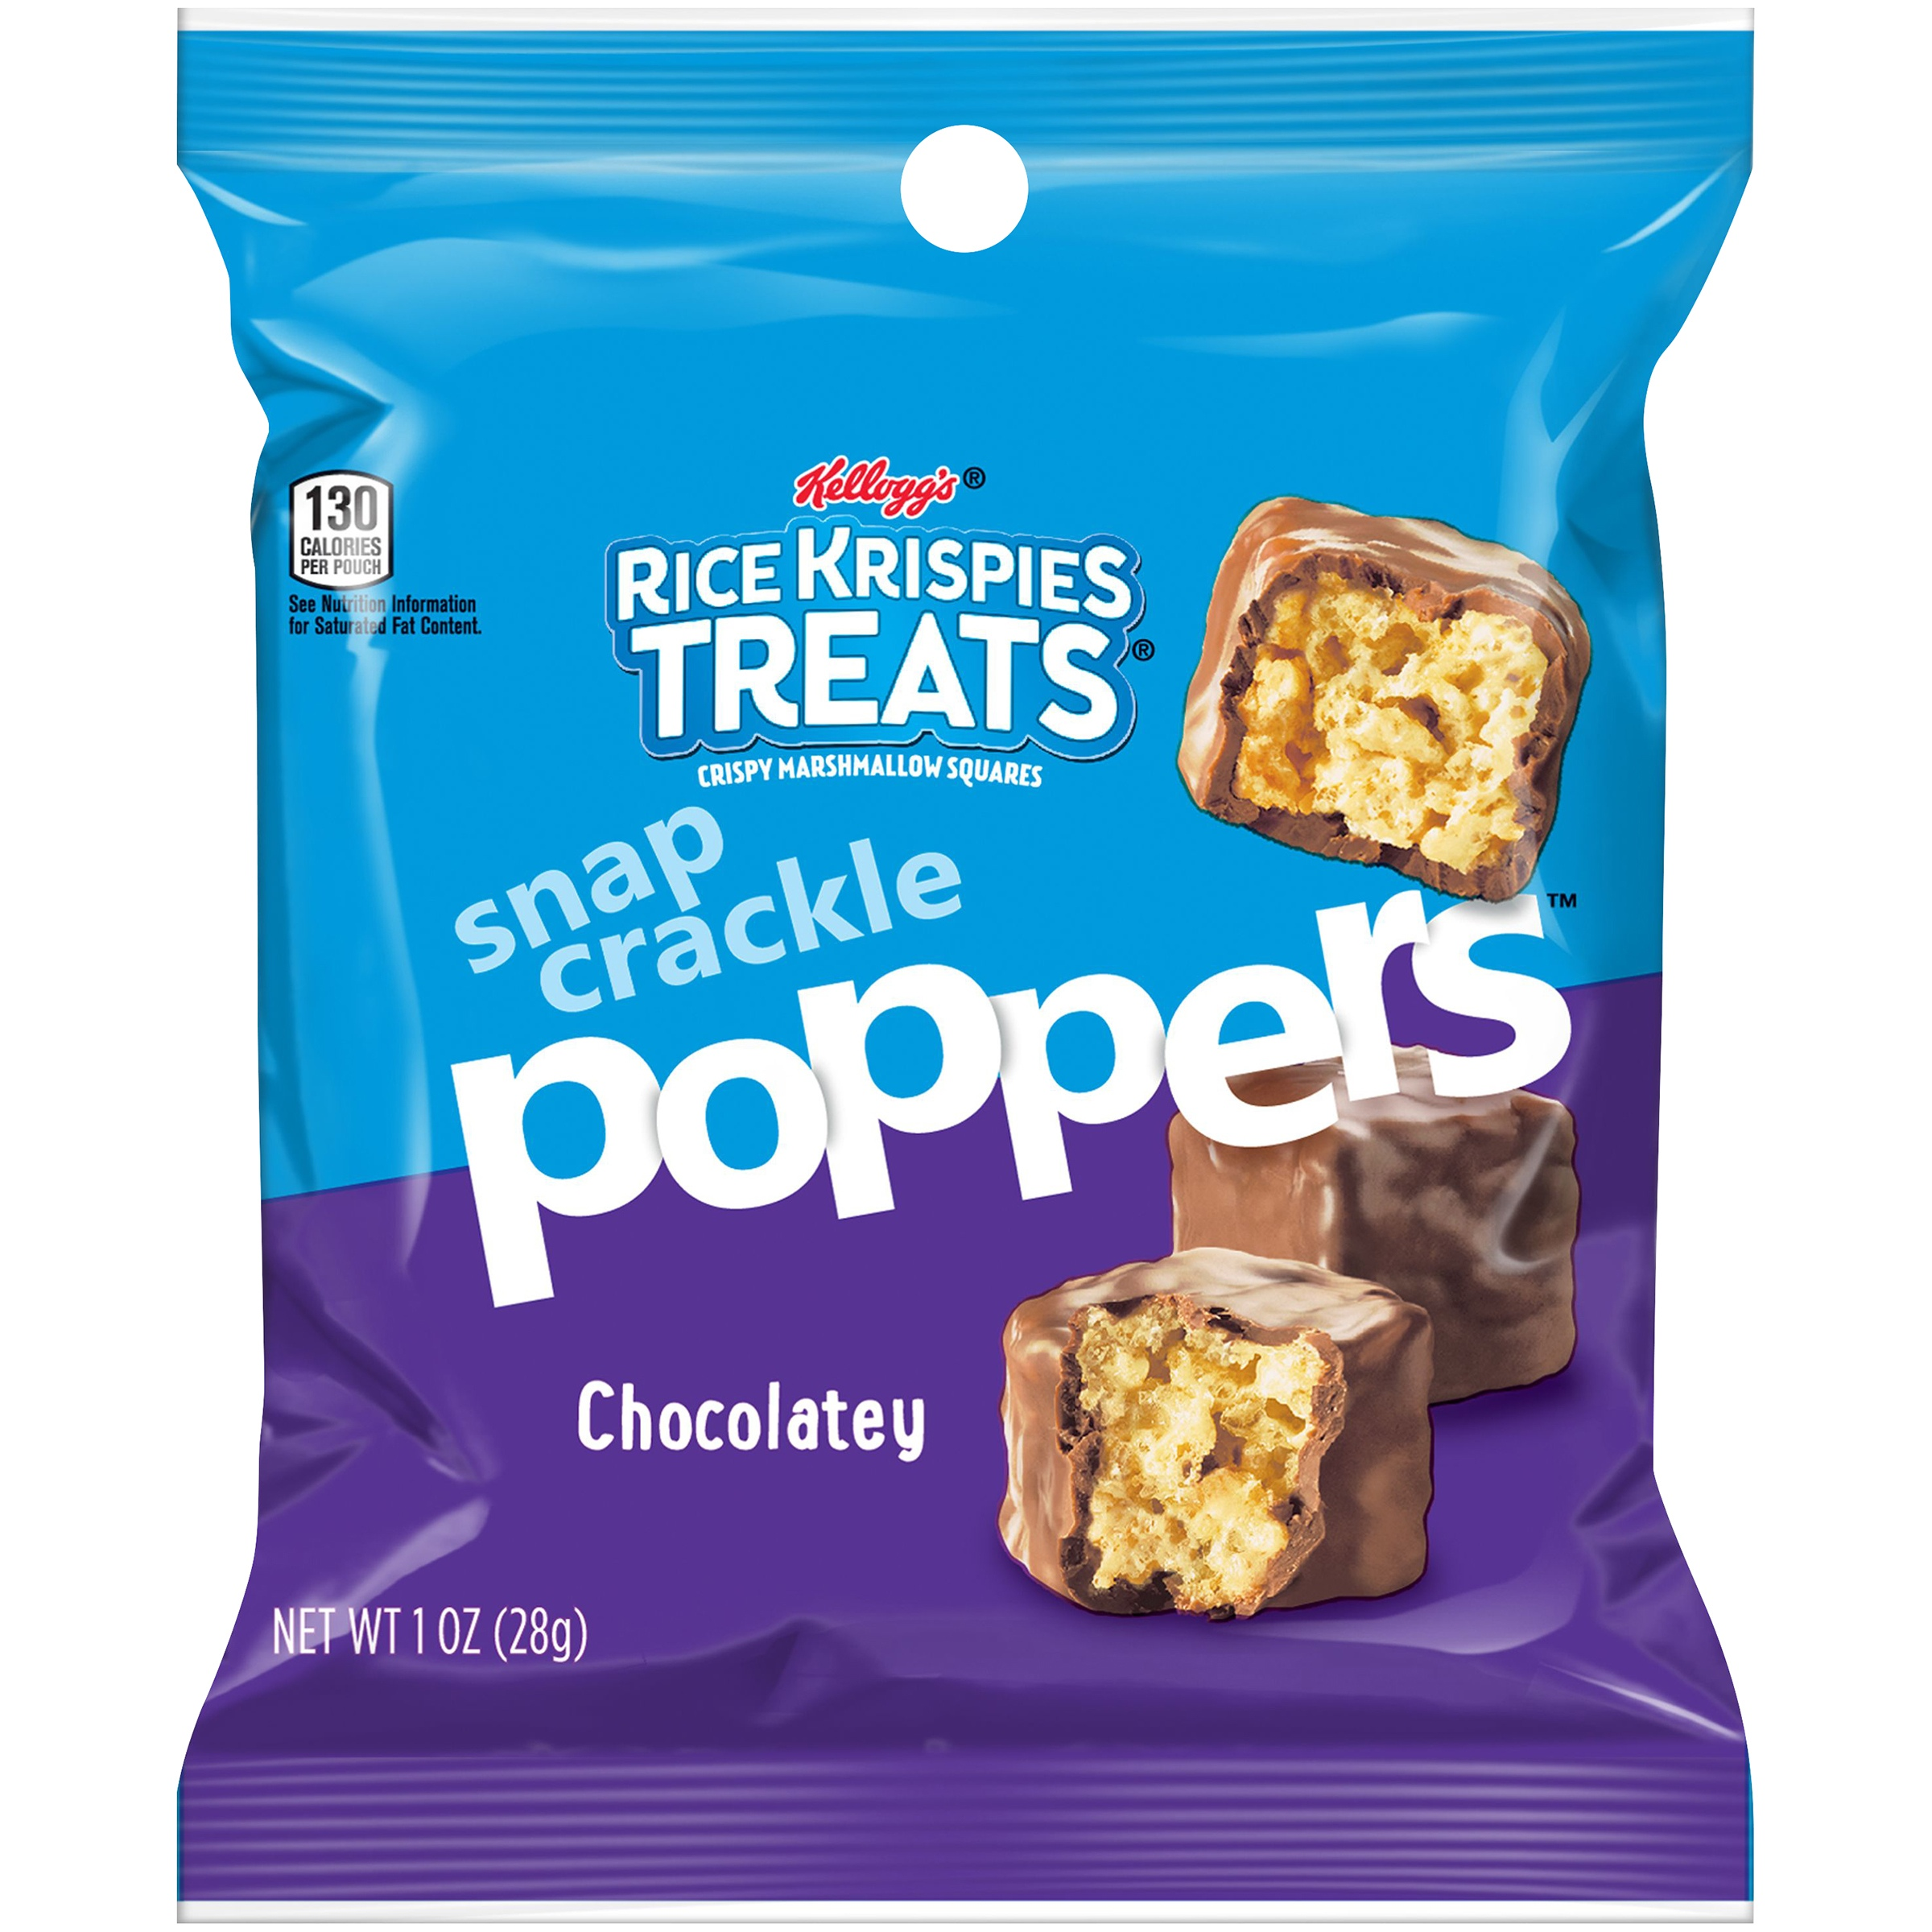 Kellogg's Rice Krispies Treats Poppers Chocolate Crispy Marshmallow Squares Snacks 1oz